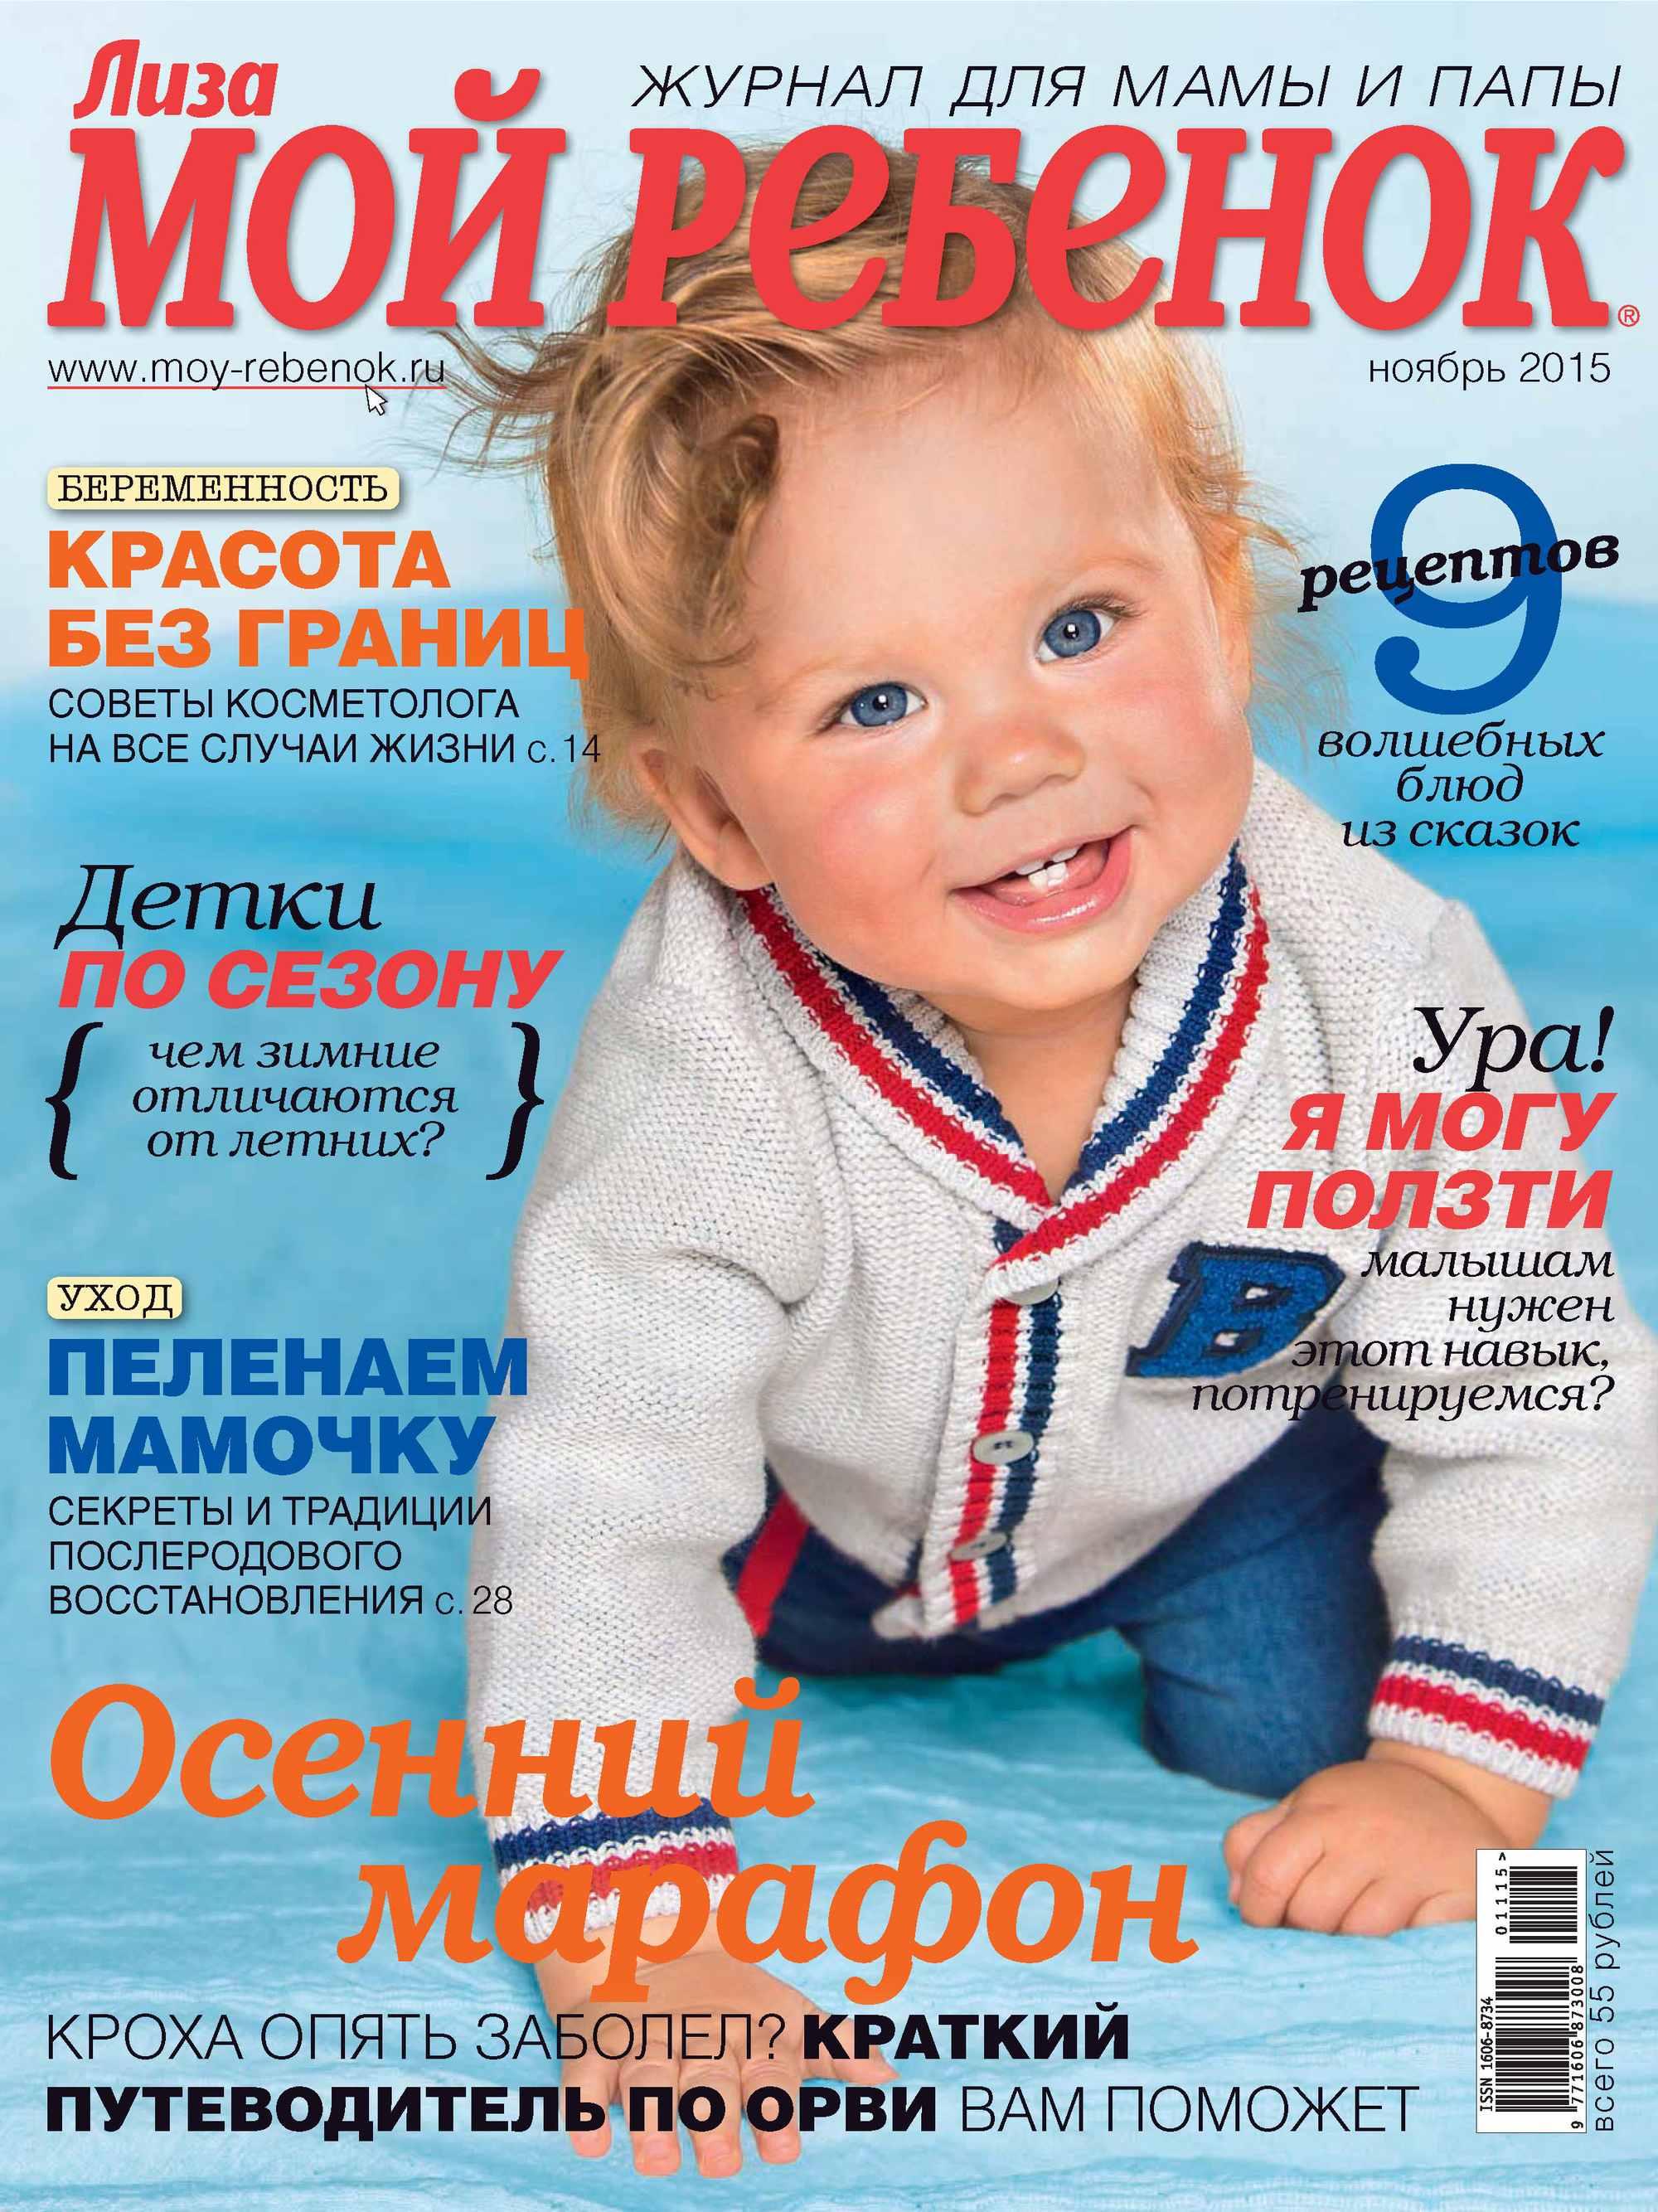 ИД «Бурда» Журнал «Лиза. Мой ребенок» №11/2015 ид бурда журнал лиза мой ребенок 11 2014